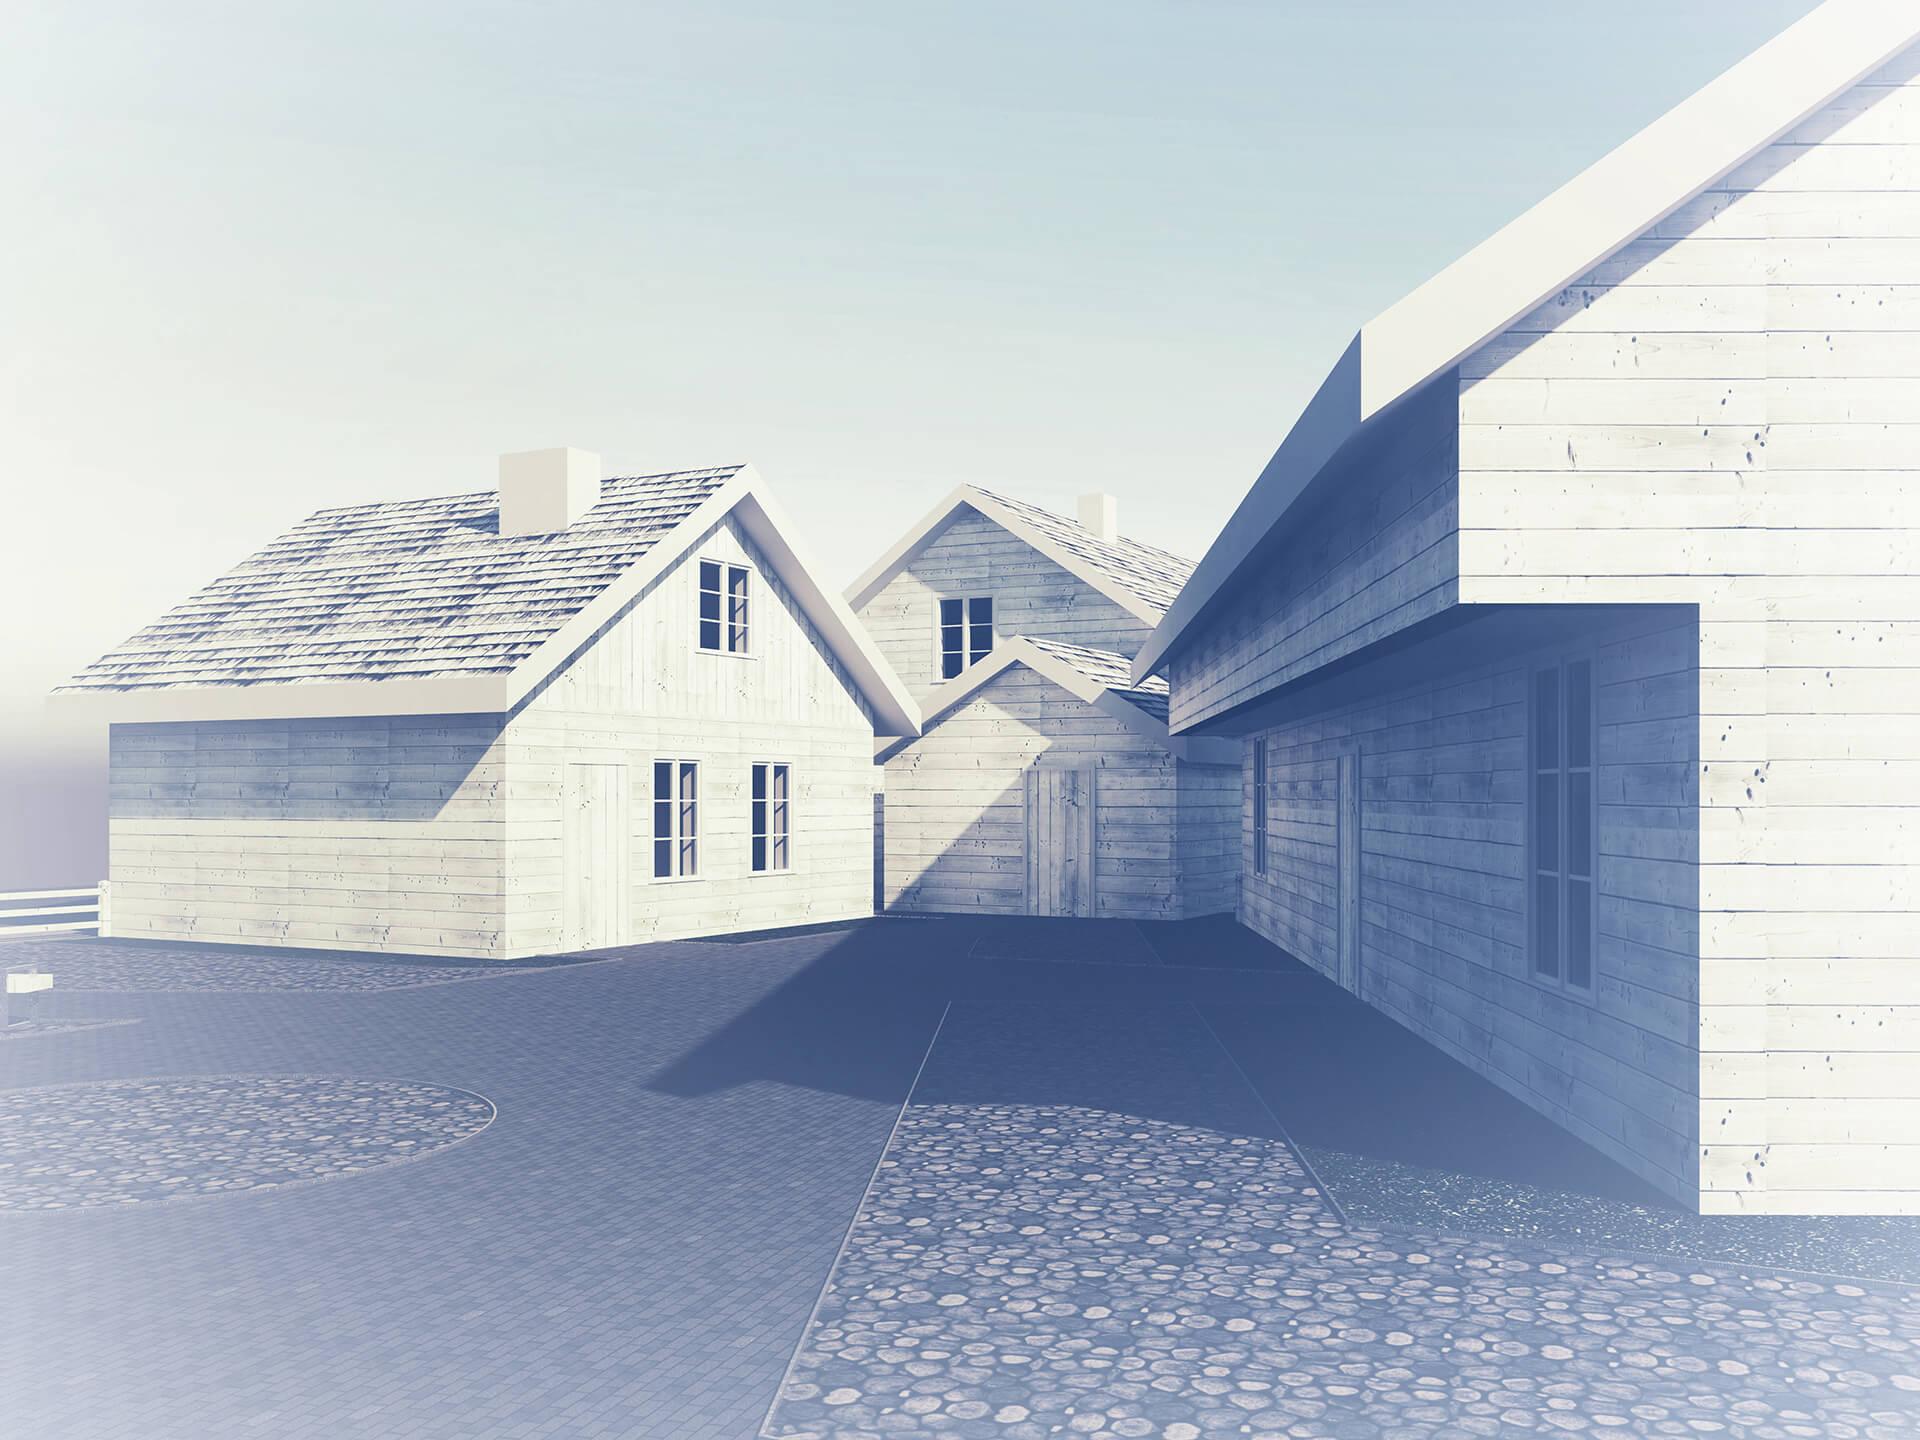 https://laagaarchitects.lv/wp-content/uploads/2019/11/03-04-10-Ruuj.jpg